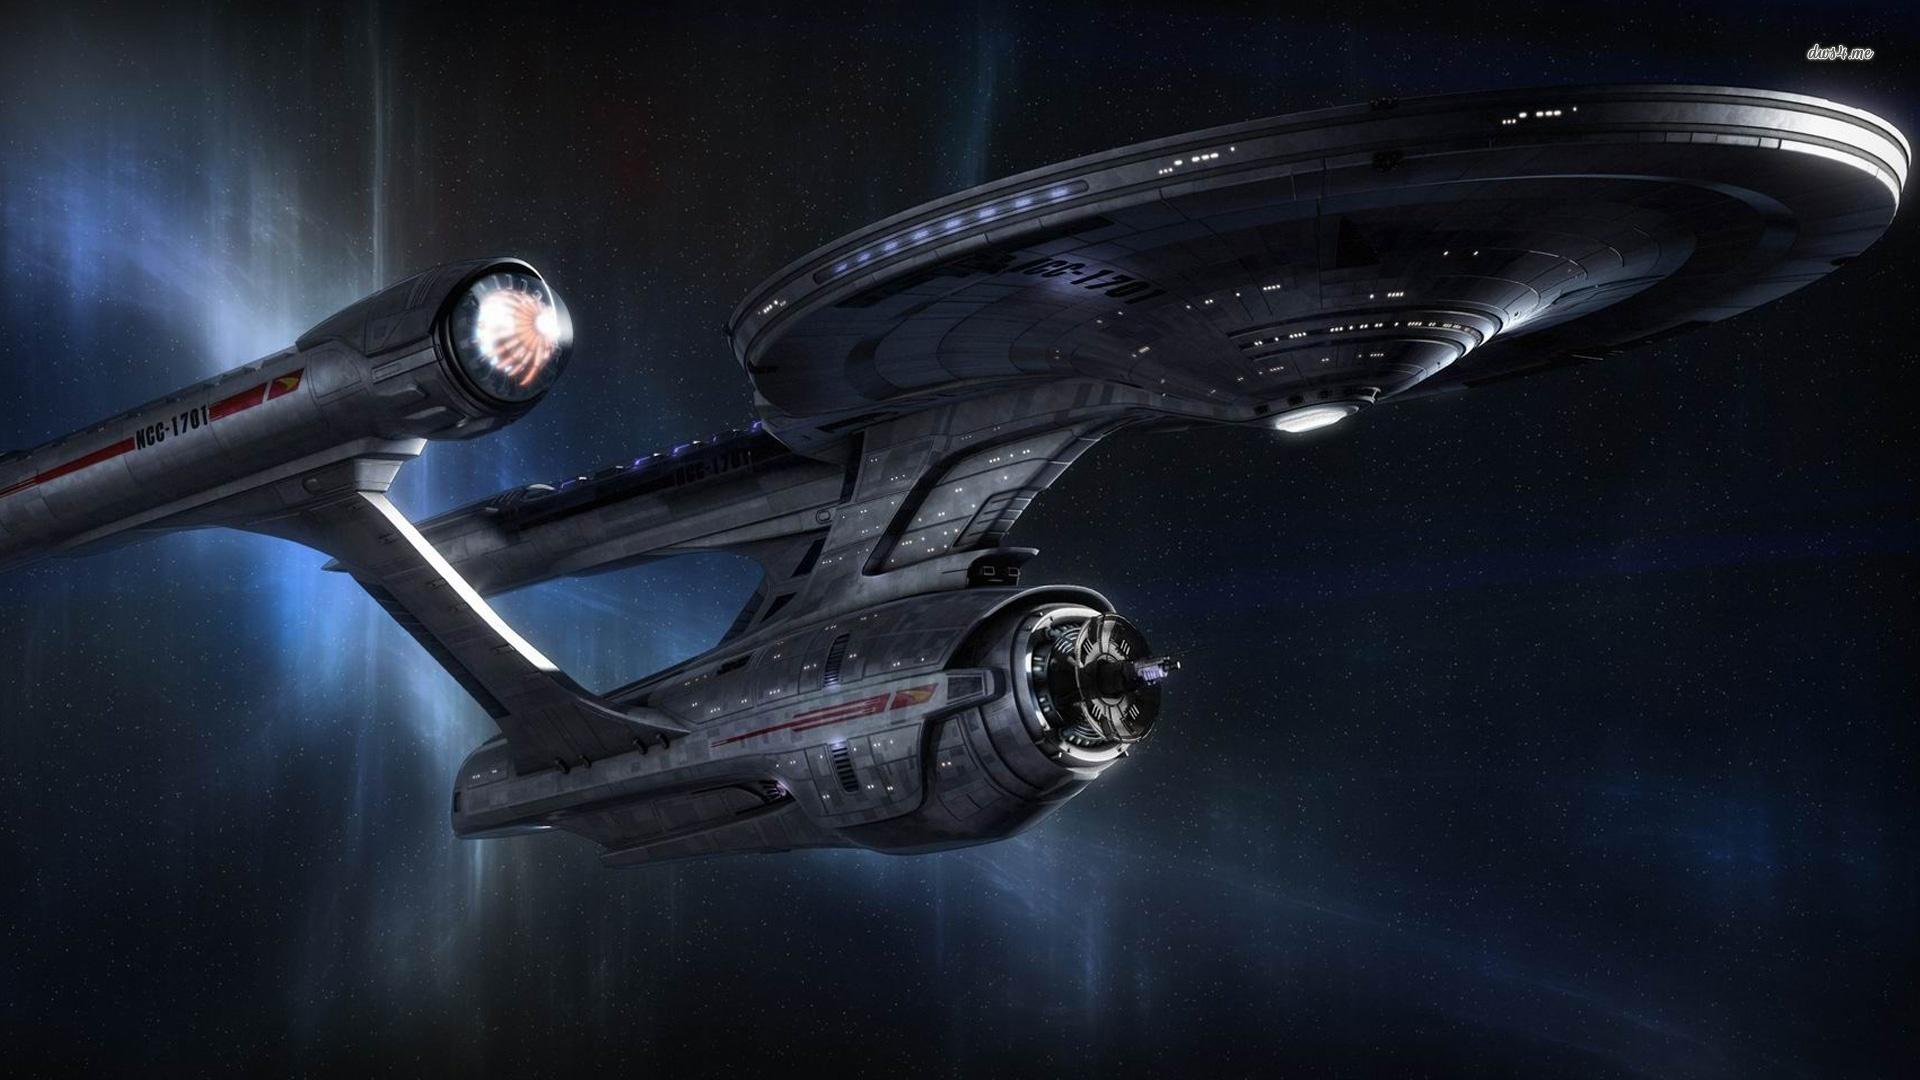 Free Download Star Trek Into Darkness Wallpaper 1280x800